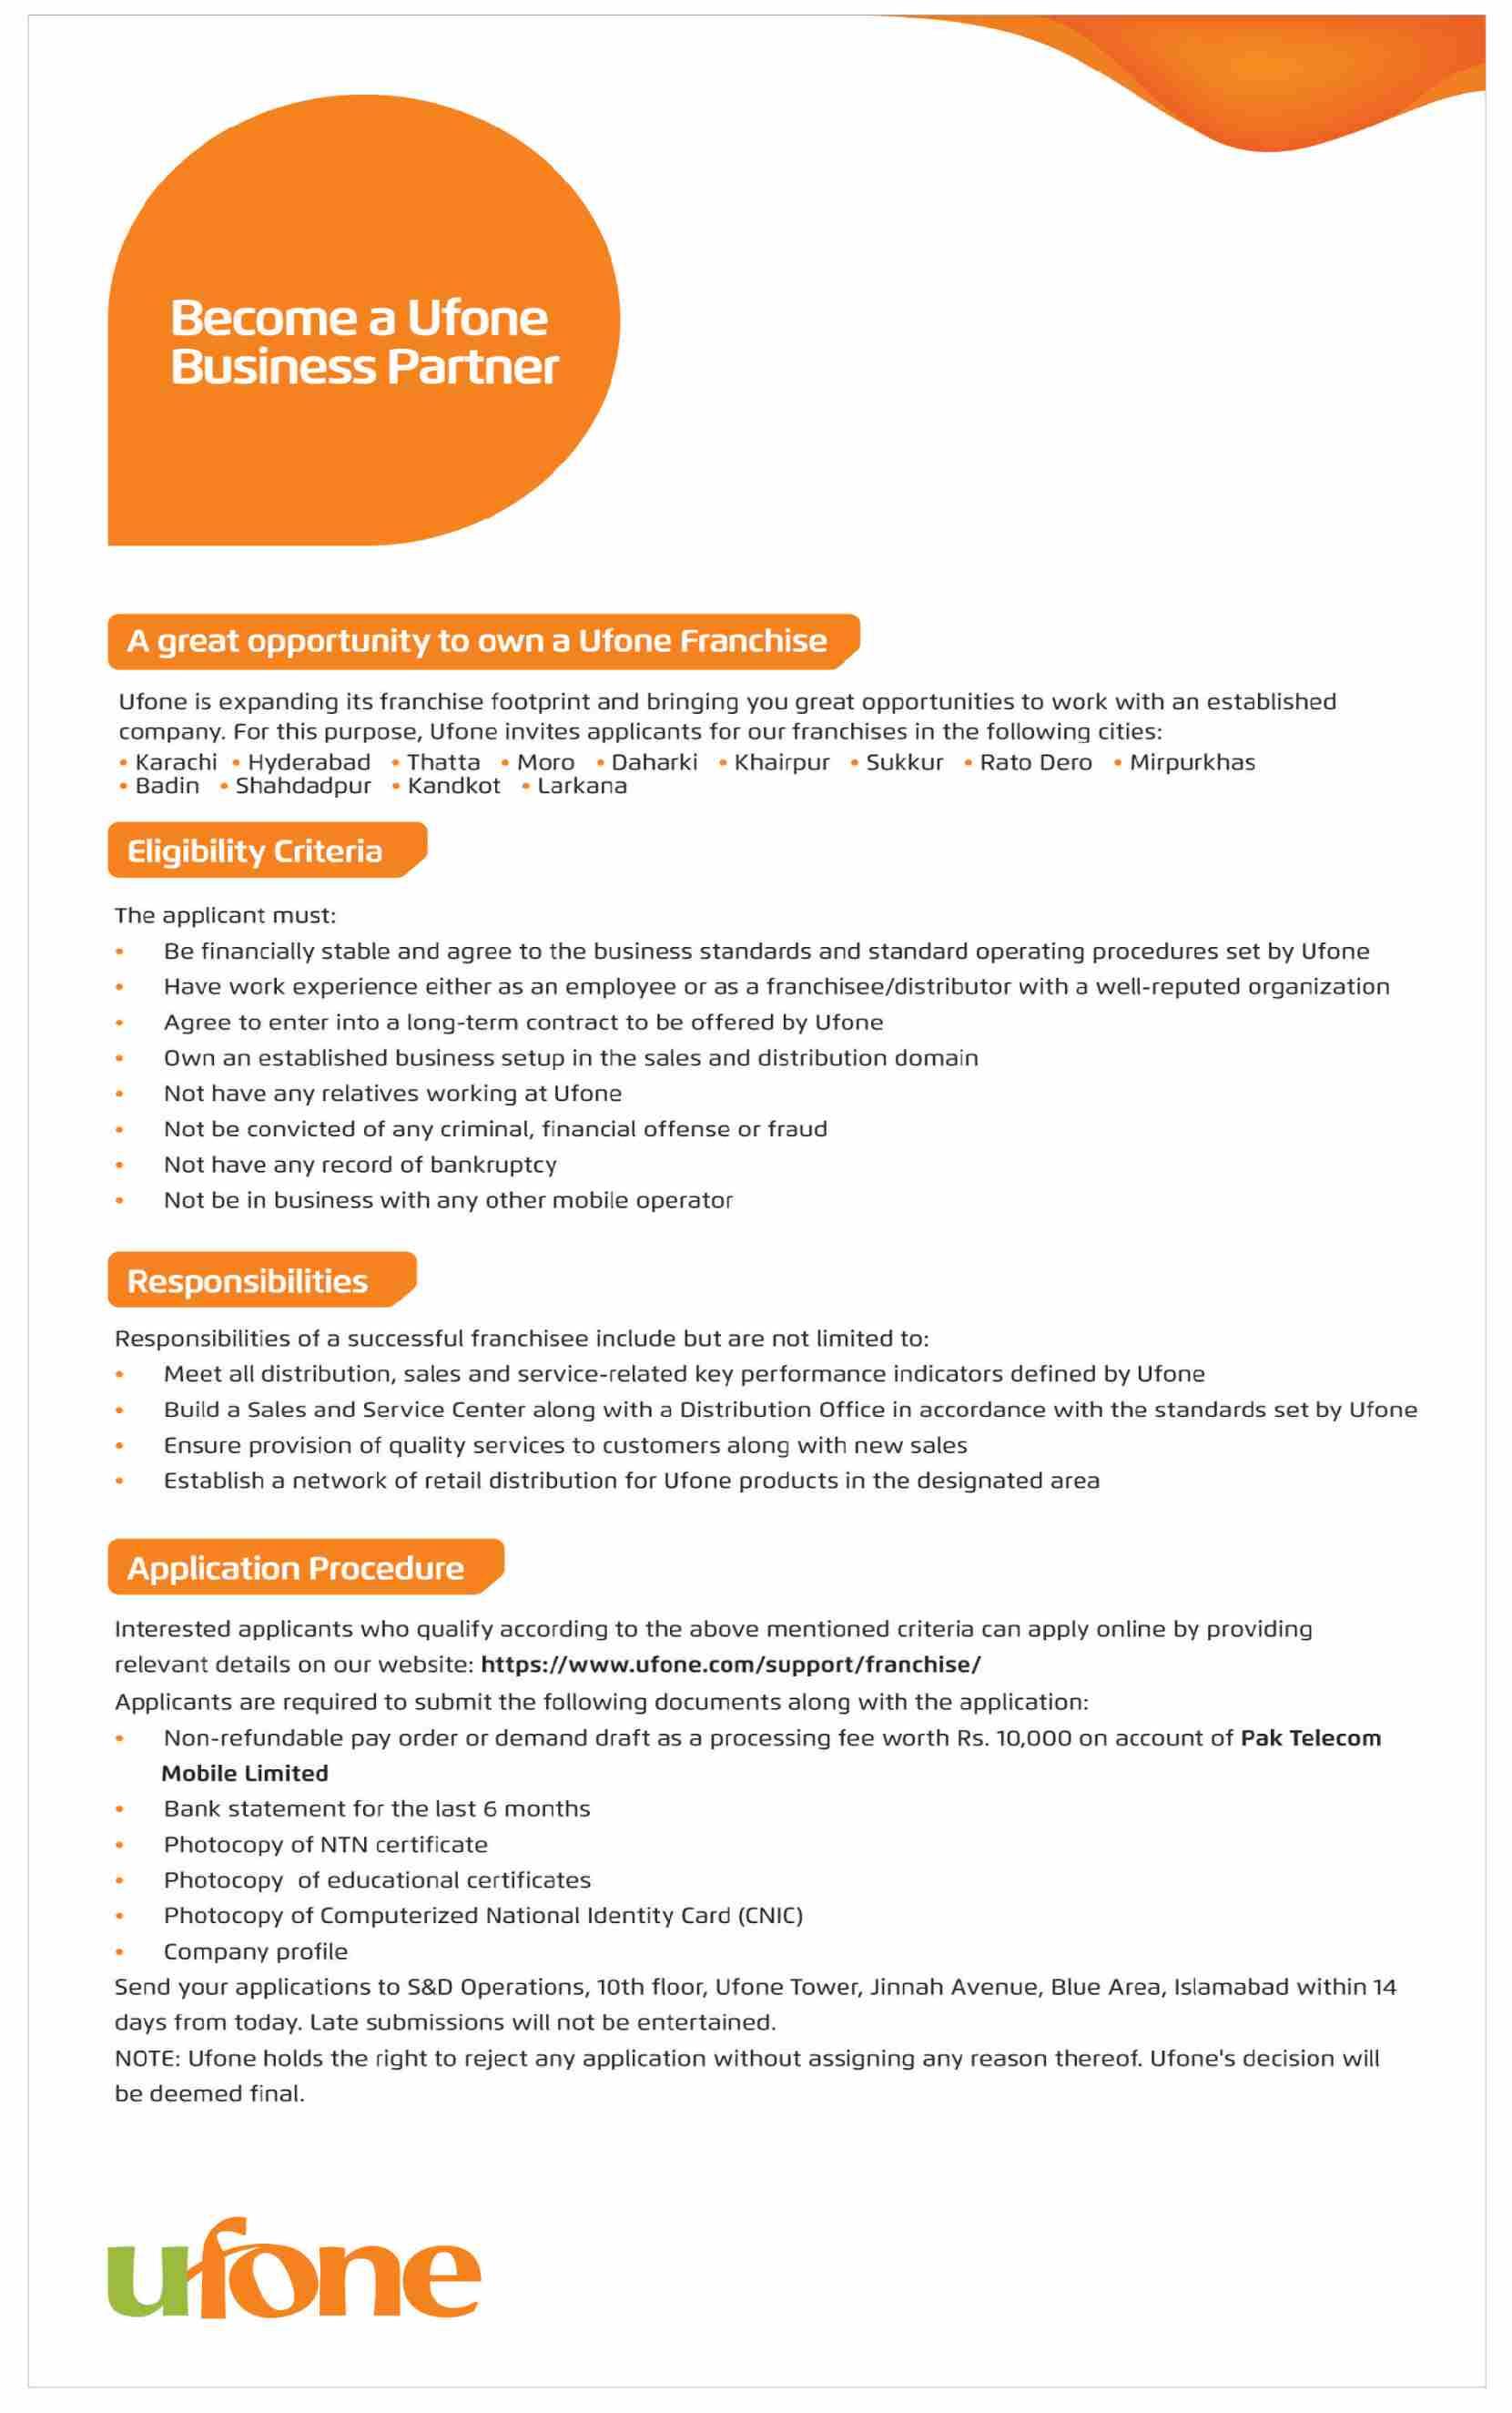 Business Partner Jobs in Ufone